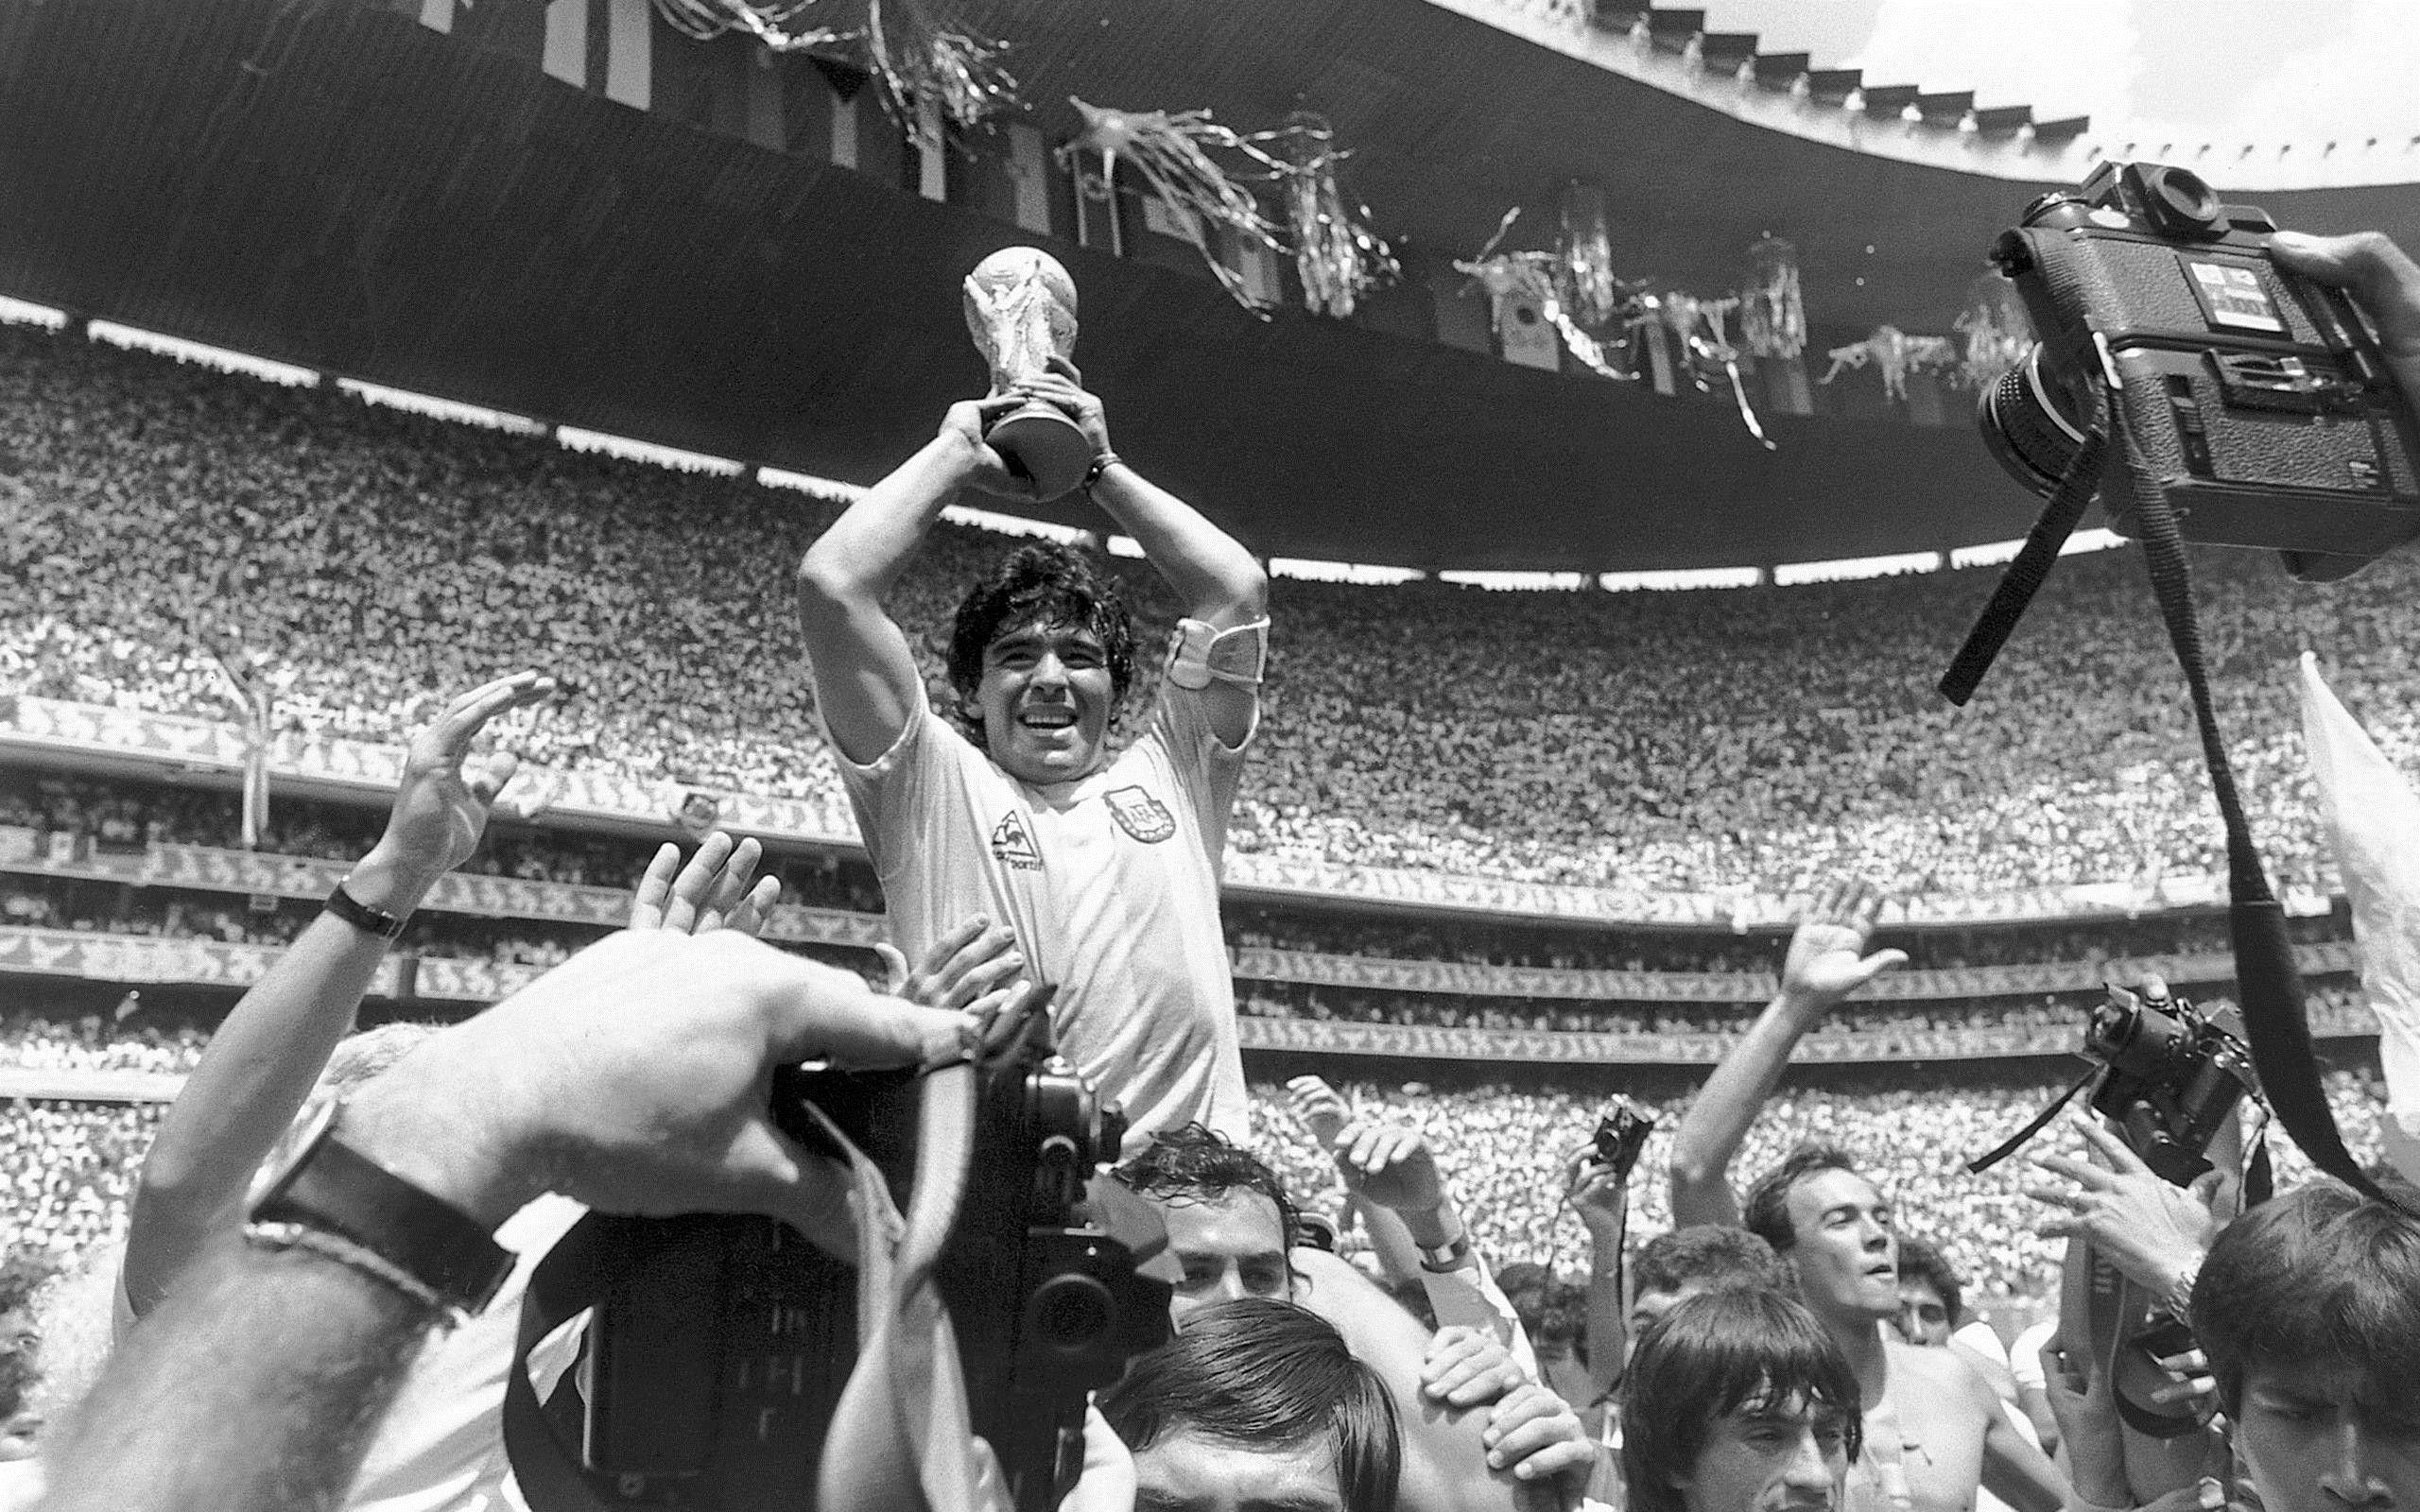 Maradona World Cup 1986 Black And White 2560x1600 Noir Et Blanc